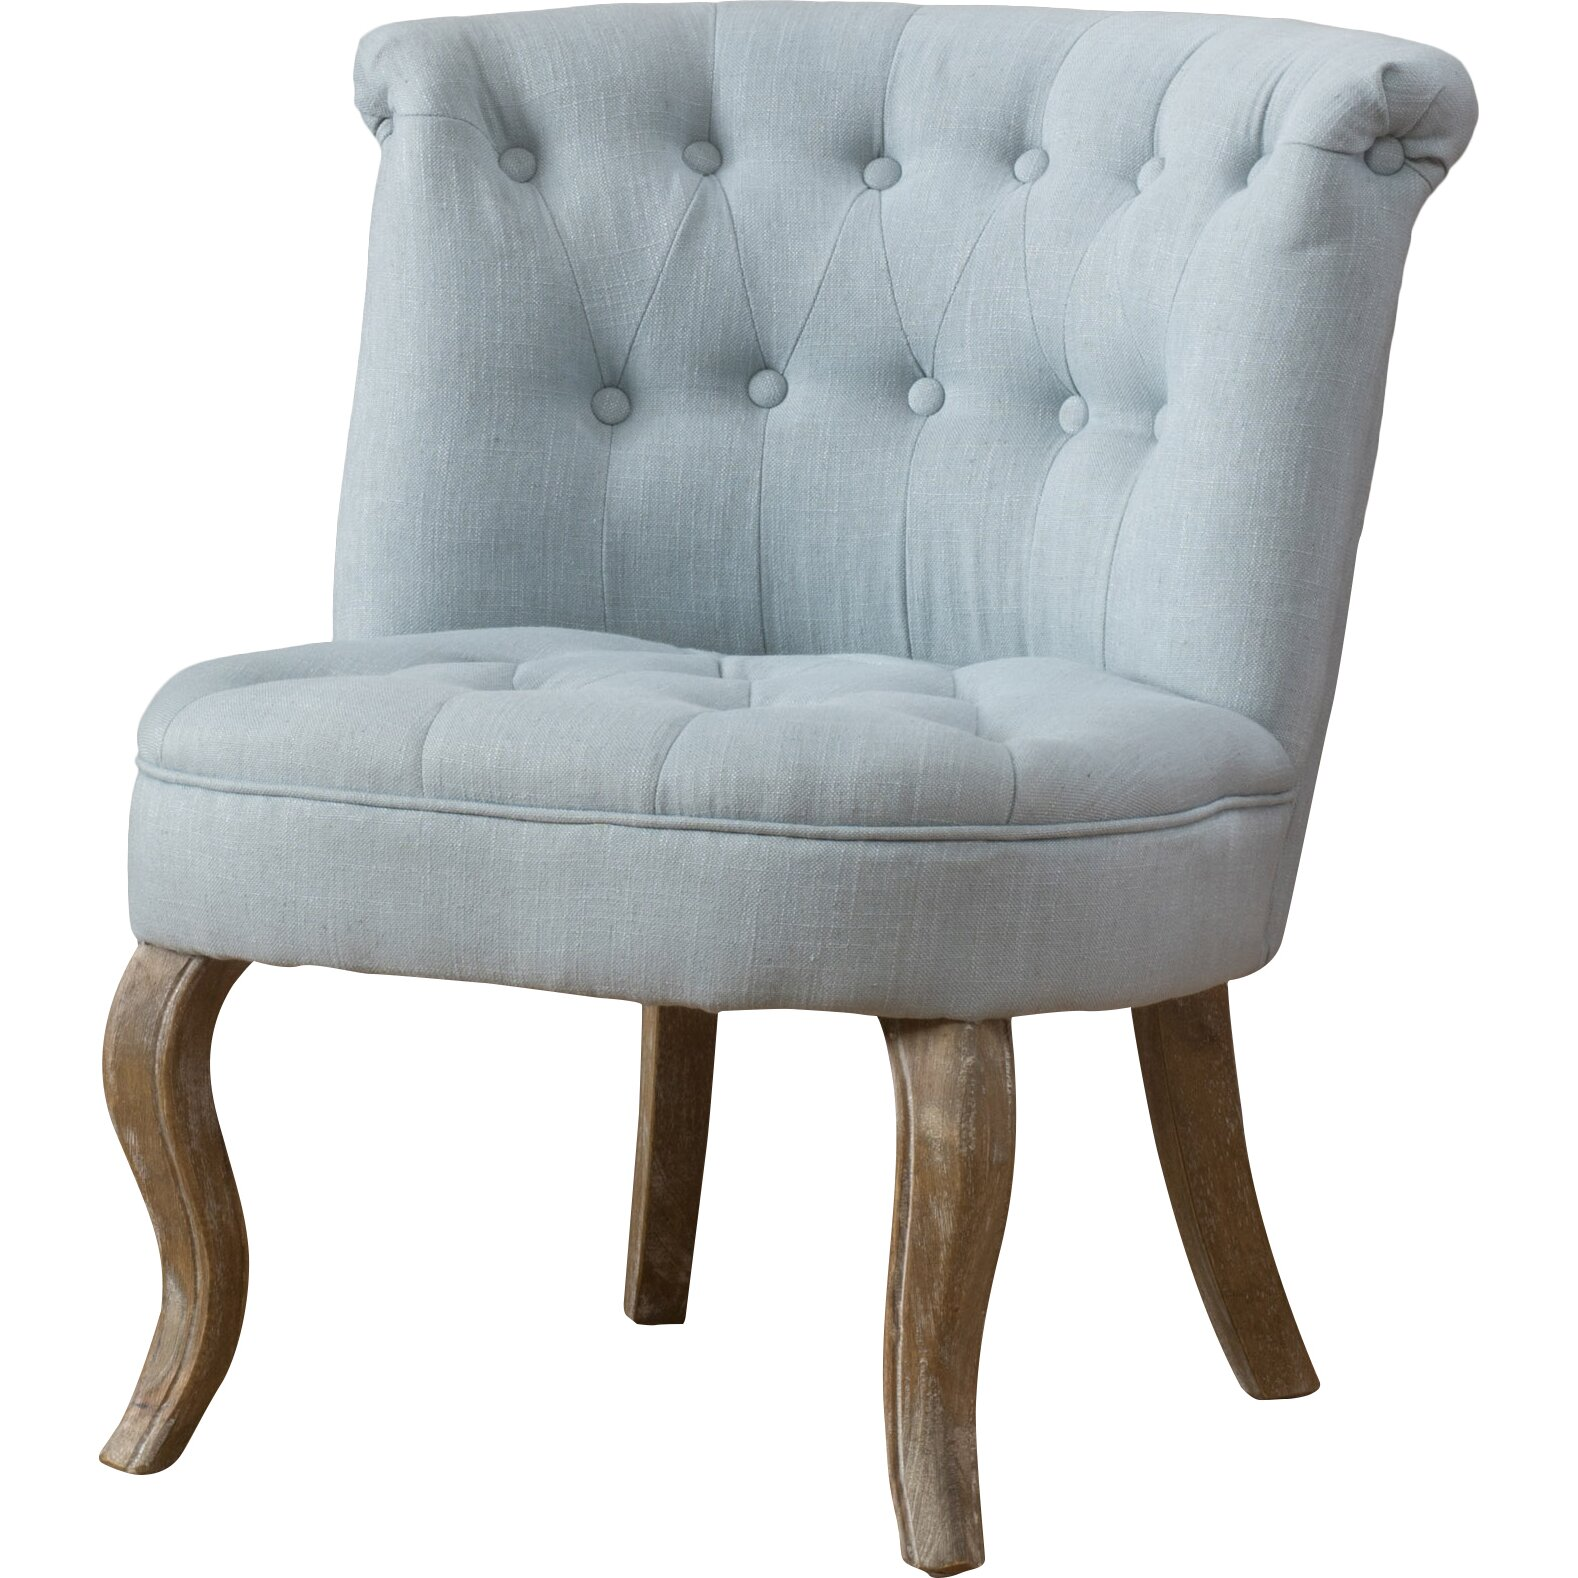 Furniture Accent Furniture Accent Chairs Lark Manor SKU: LARK1409